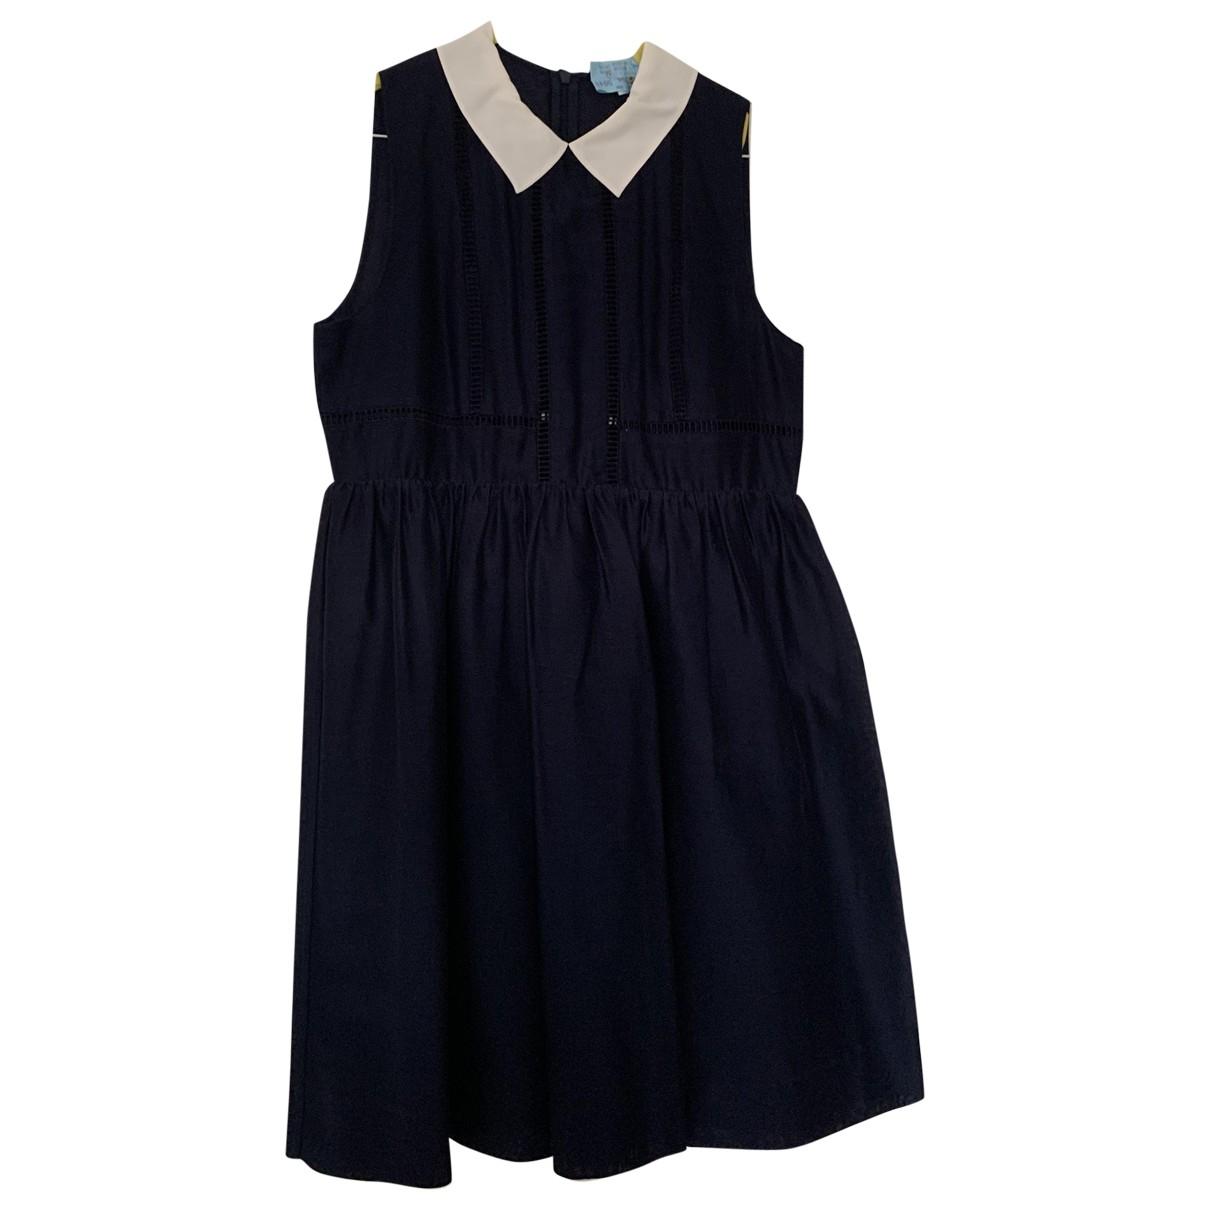 Claudie Pierlot \N Navy Cotton dress for Women 36 FR